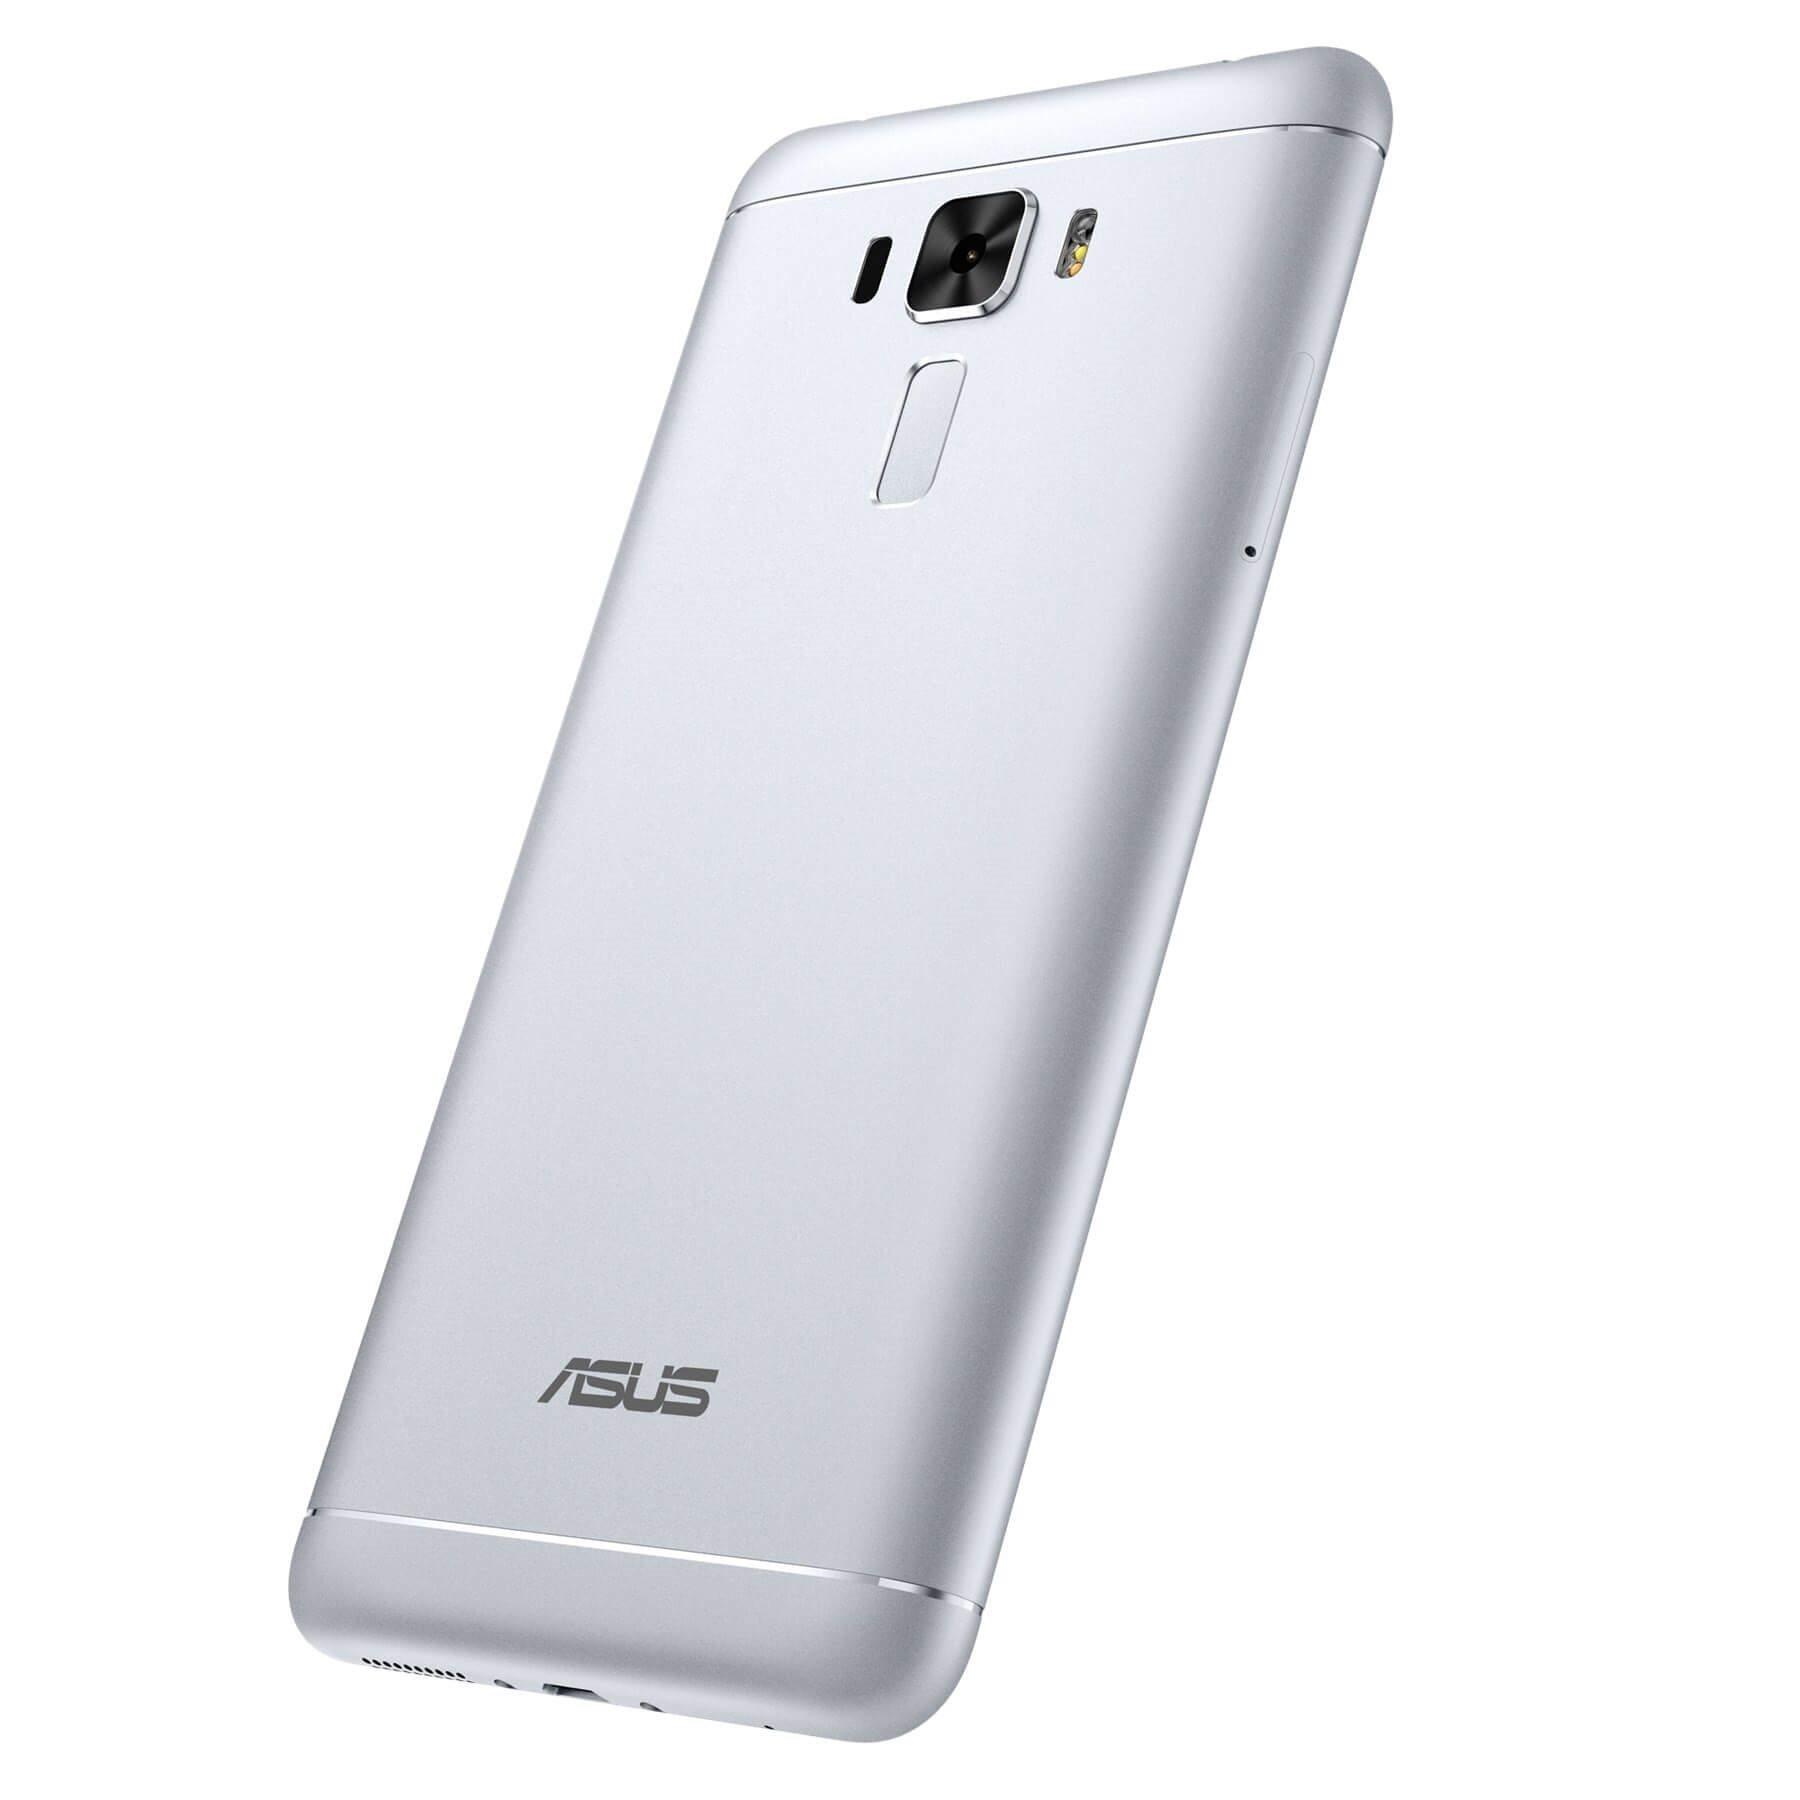 asus-zenfone-3-laser-silver-image-hd-6-newst8